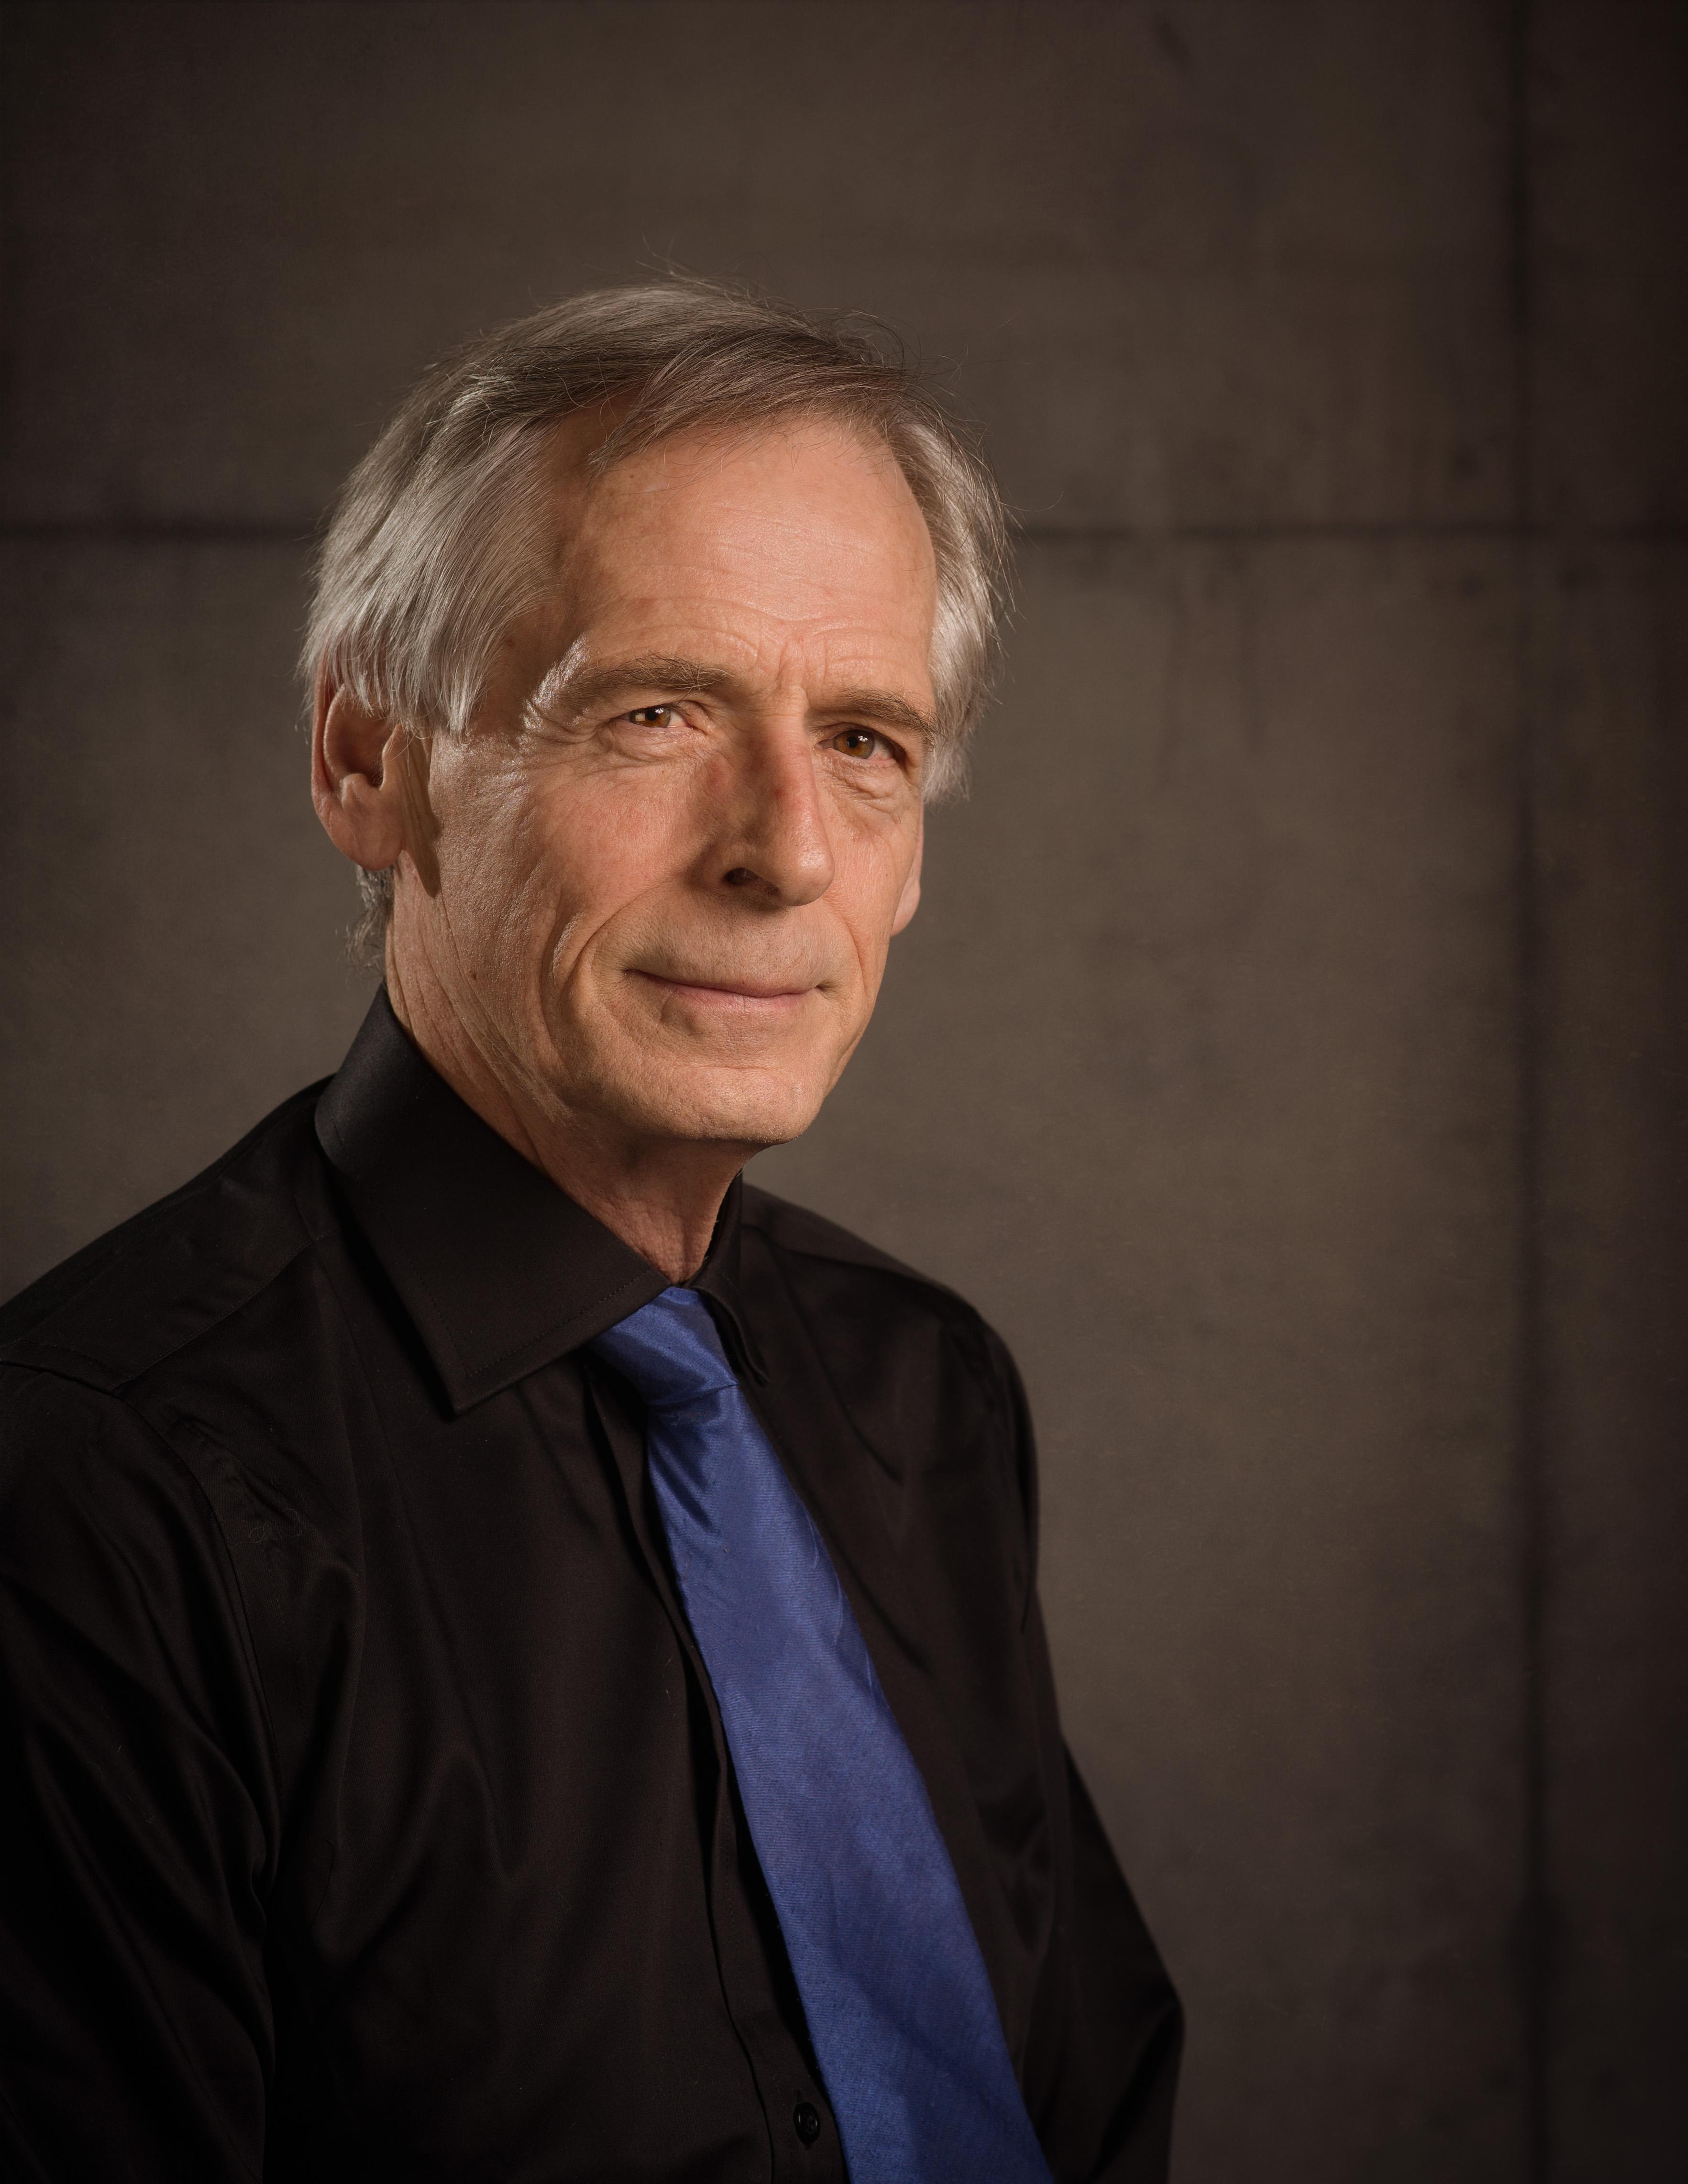 Trygve Siqueland Knudsen (tenor)